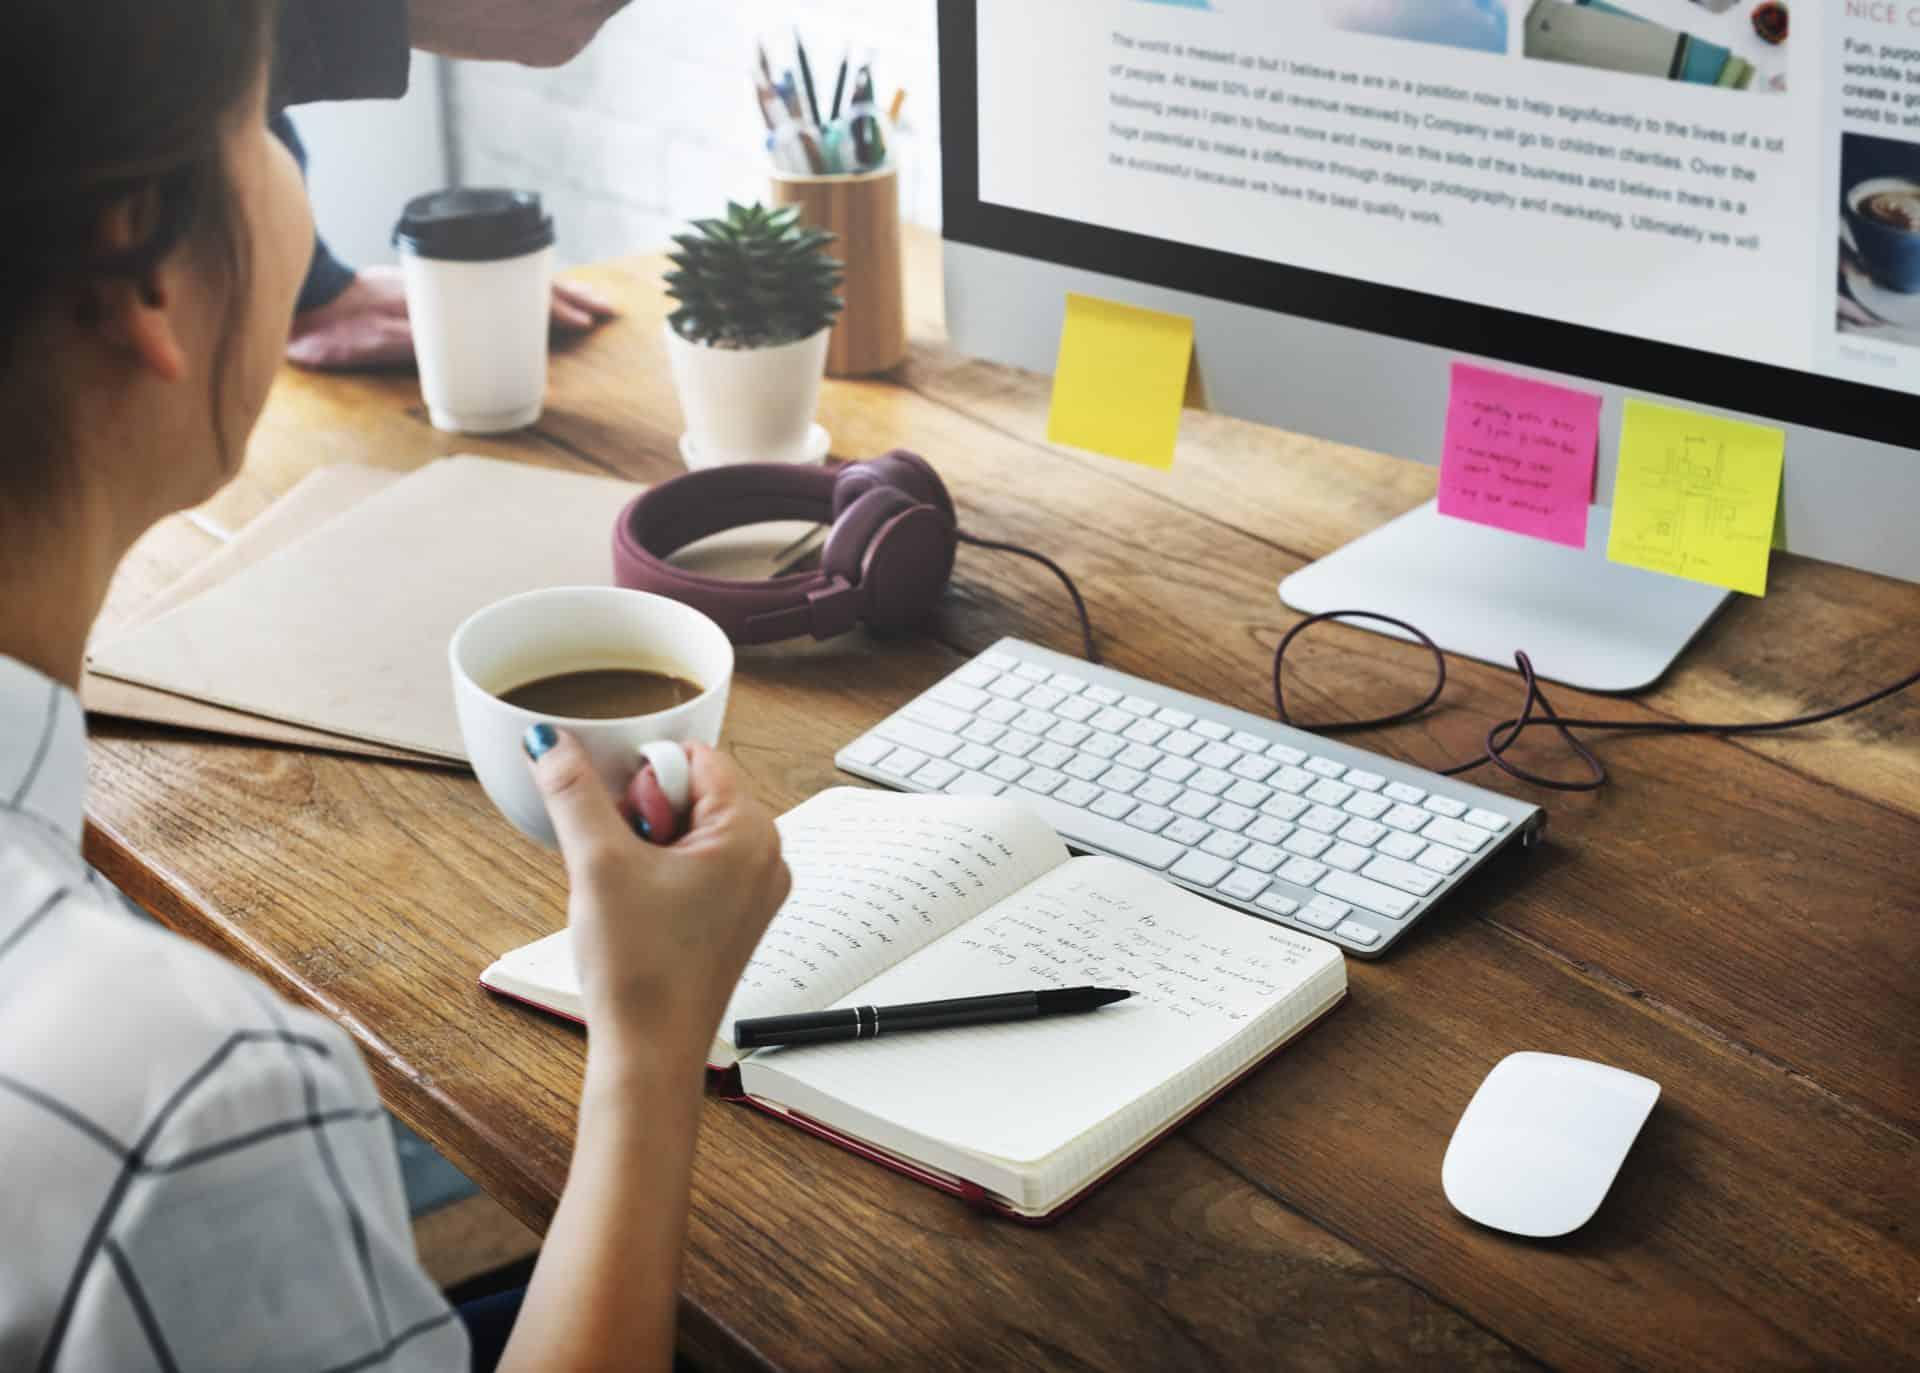 Woman editing online